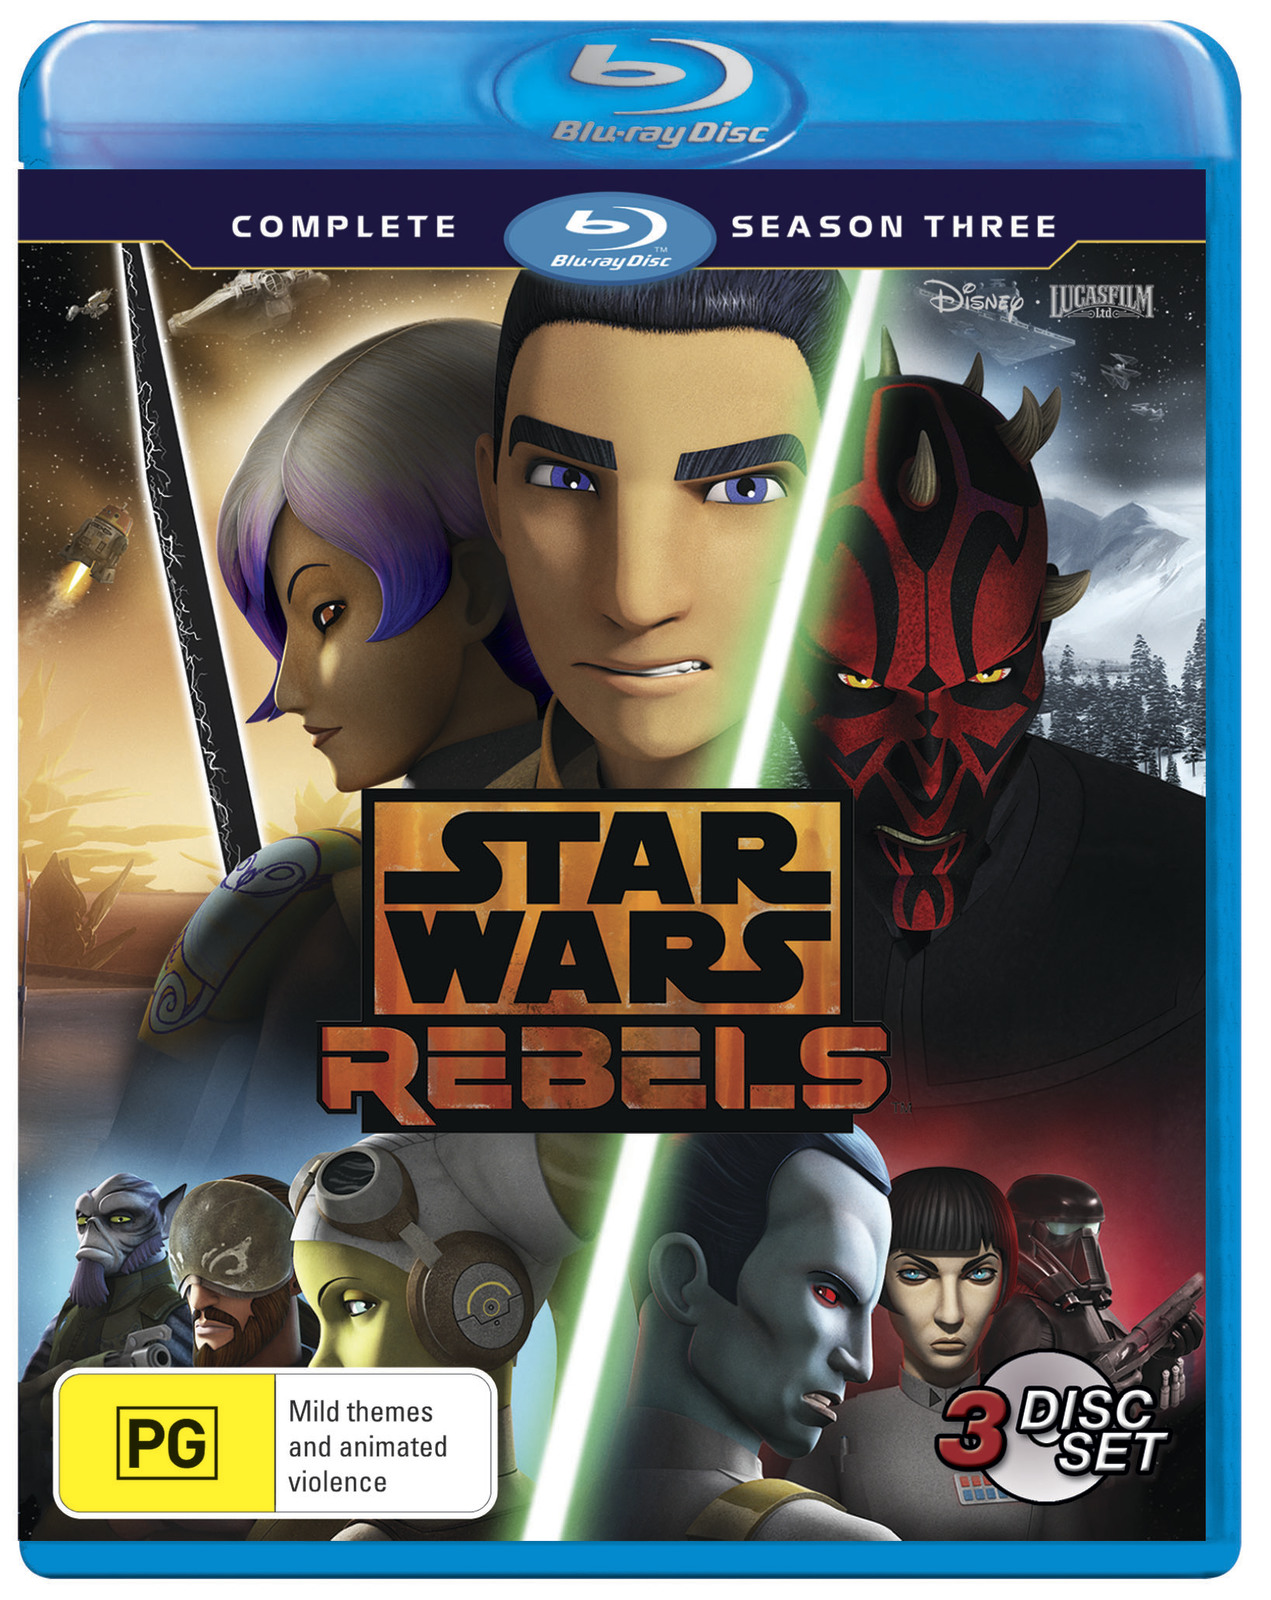 Star Wars: Rebels - Season 3 on Blu-ray image